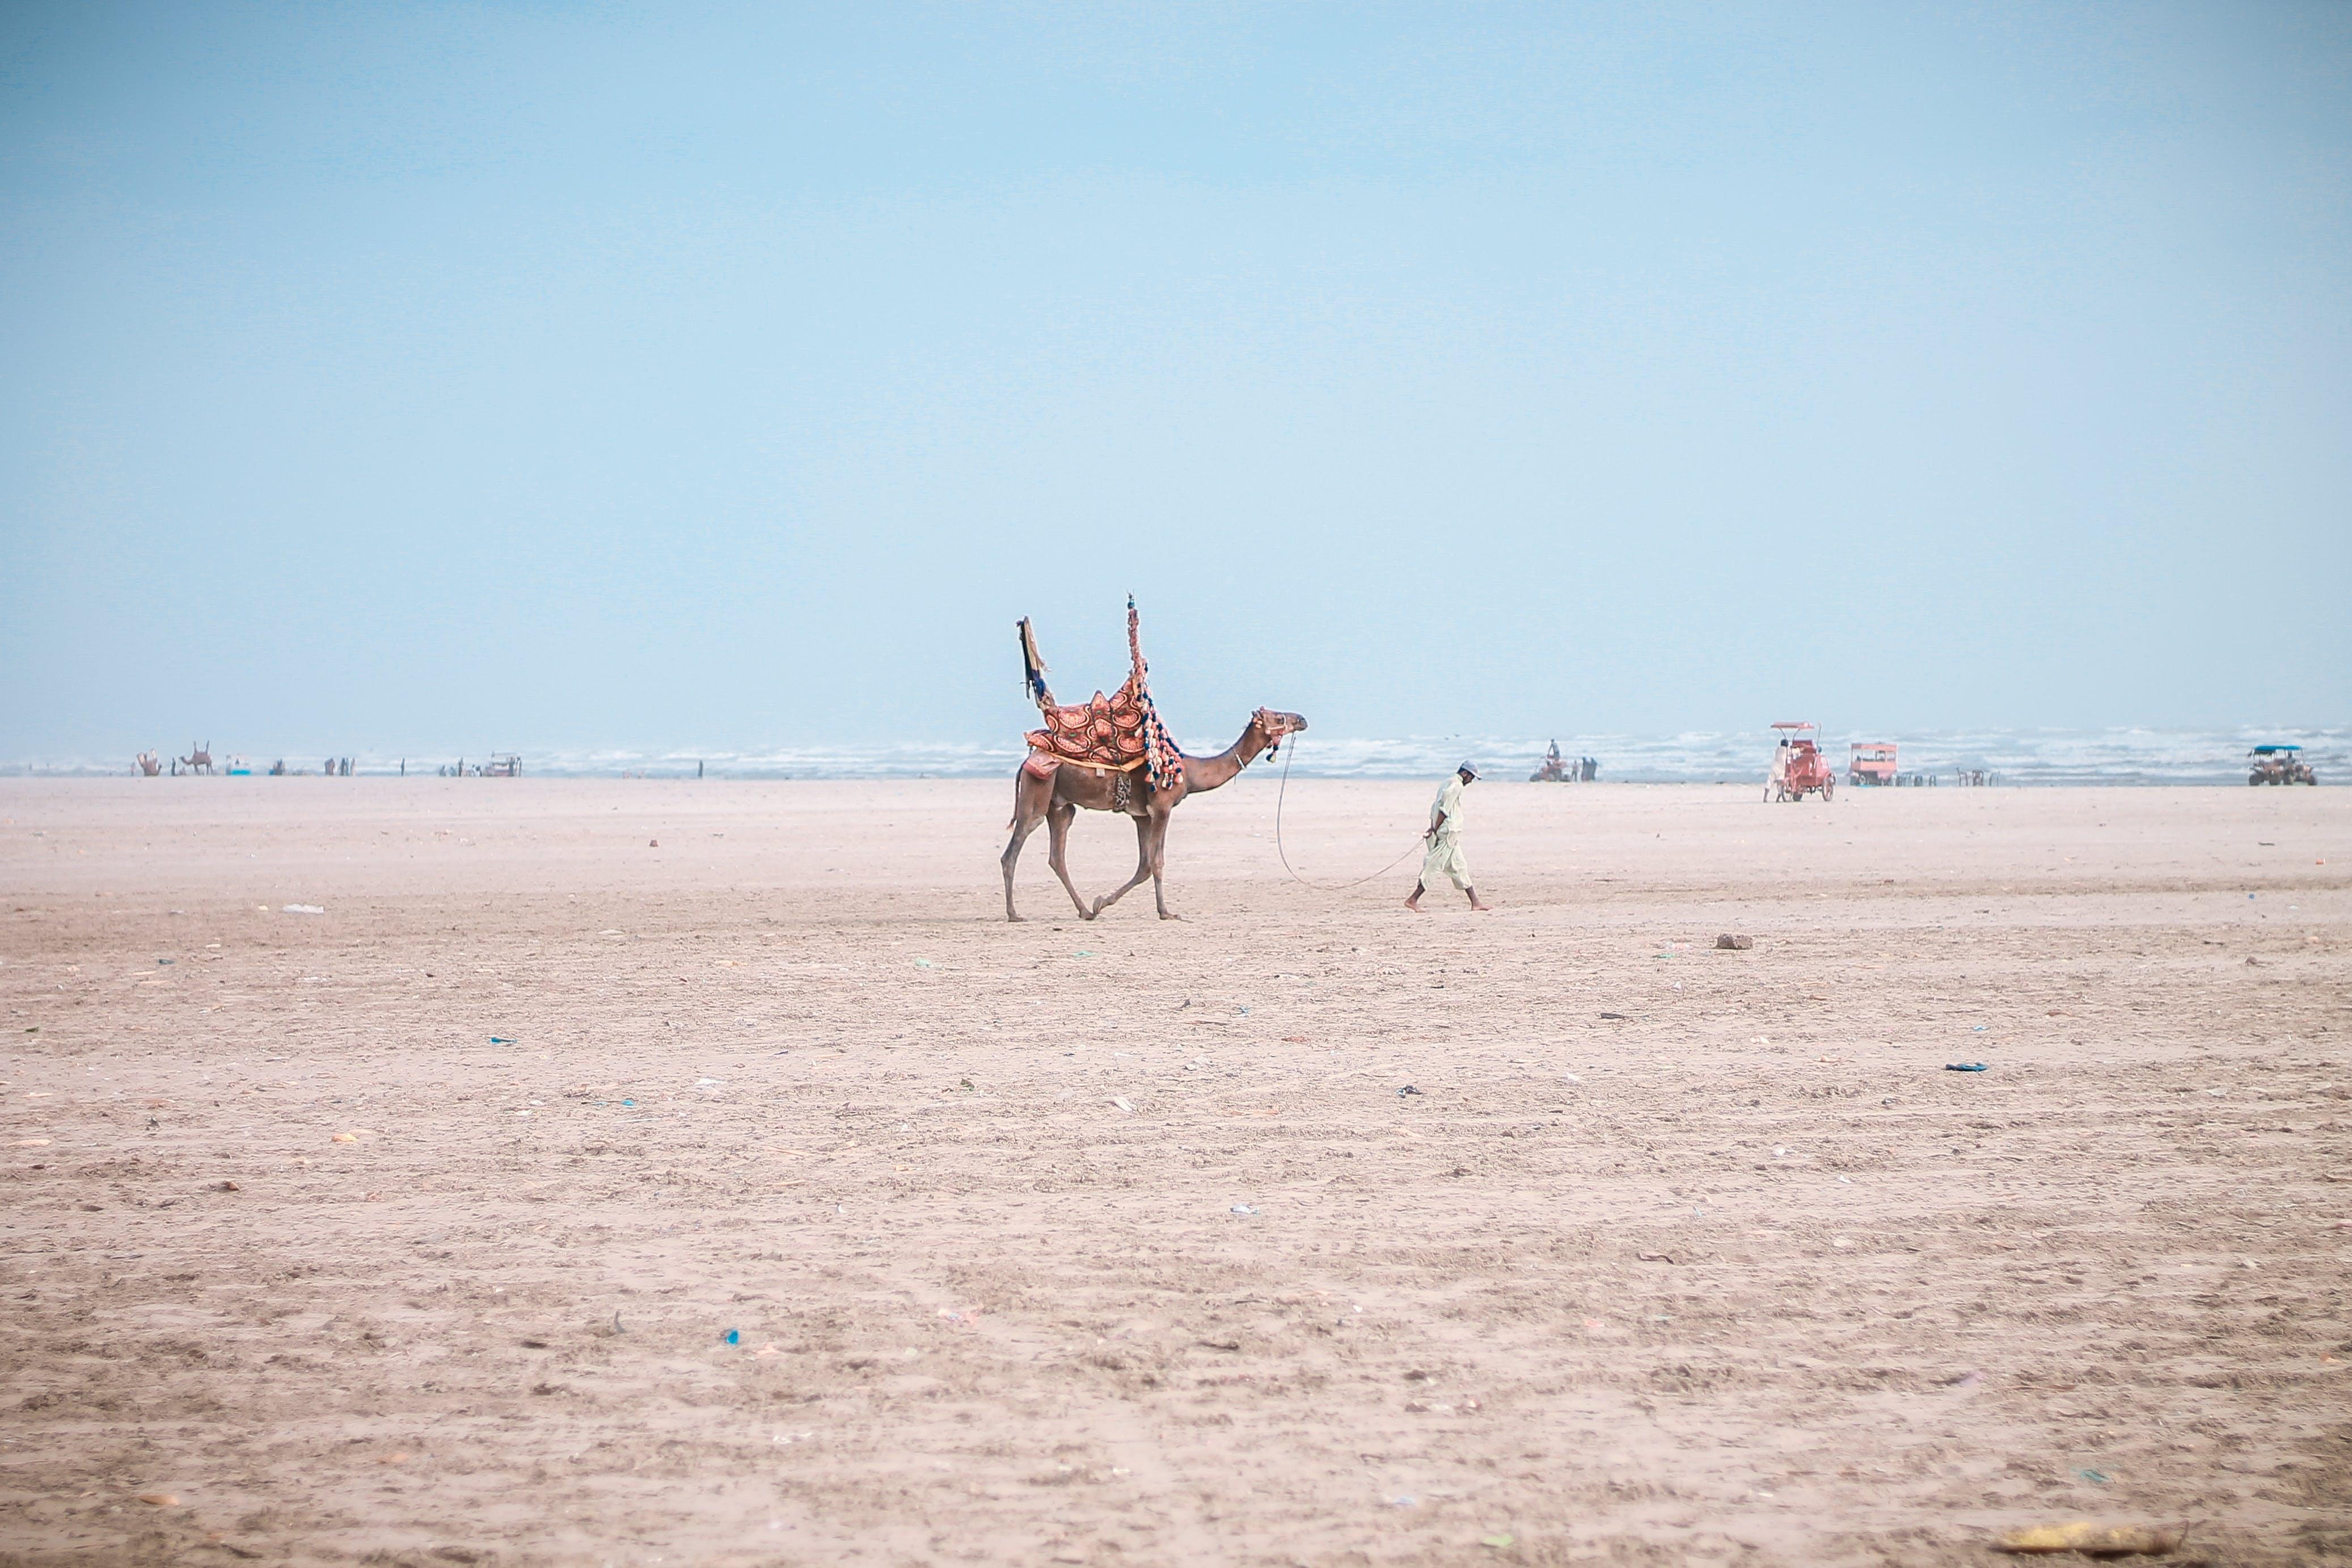 Brown Camel Following Man Under Blue Sky